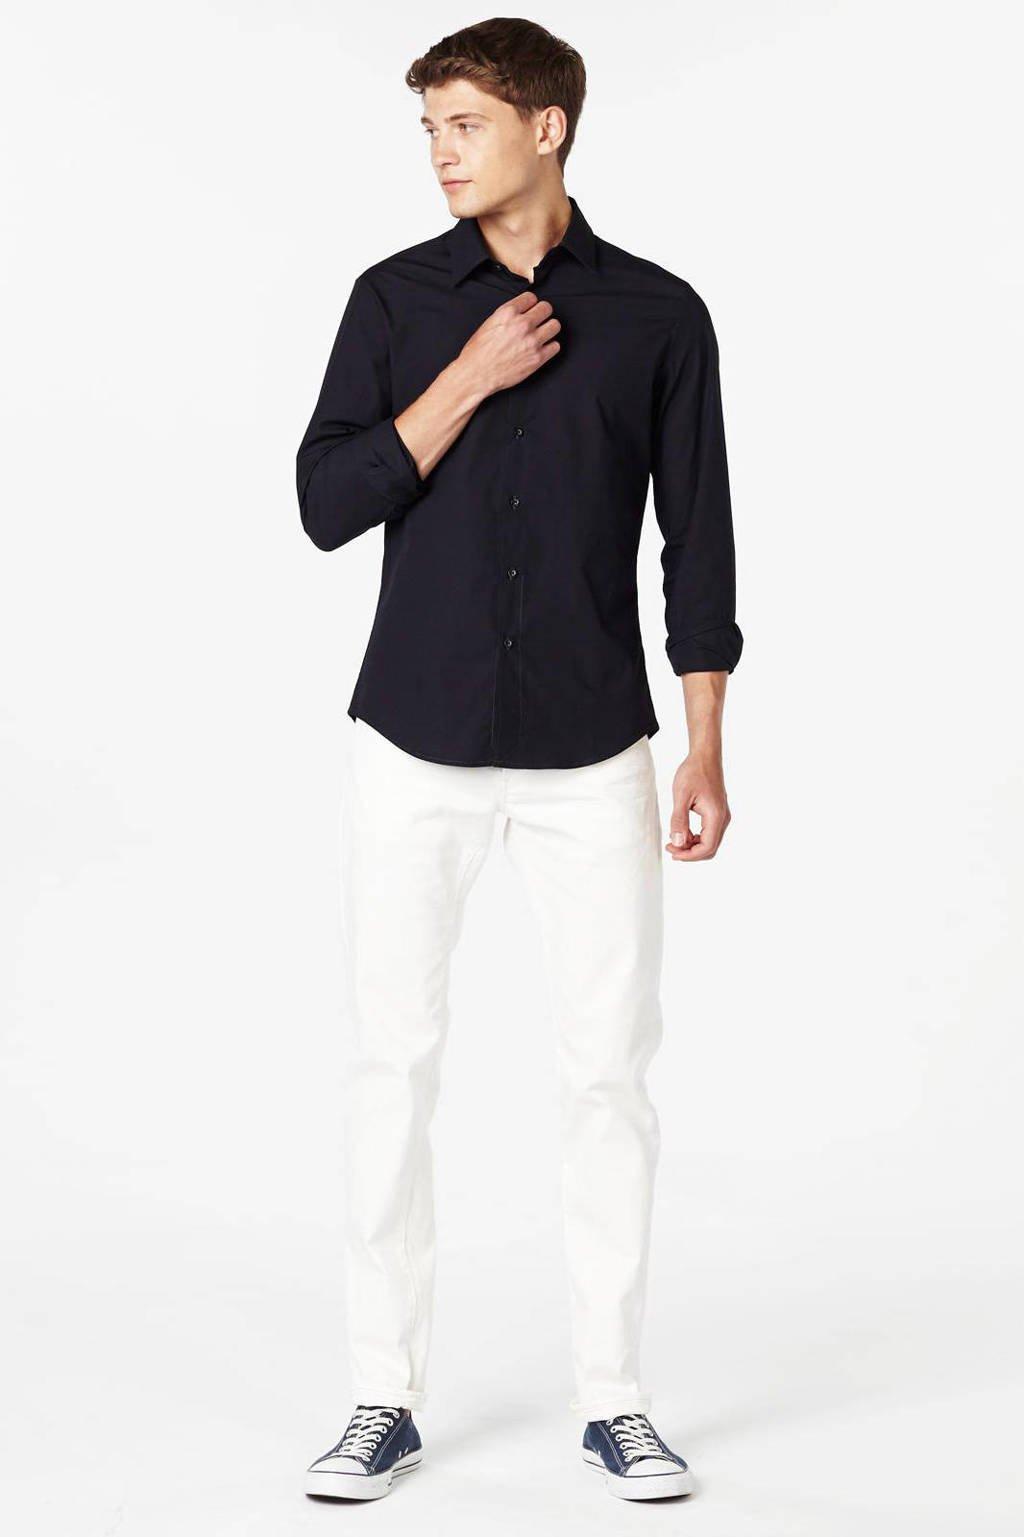 G-Star RAW Slim fit overhemd Core, Donkerblauw